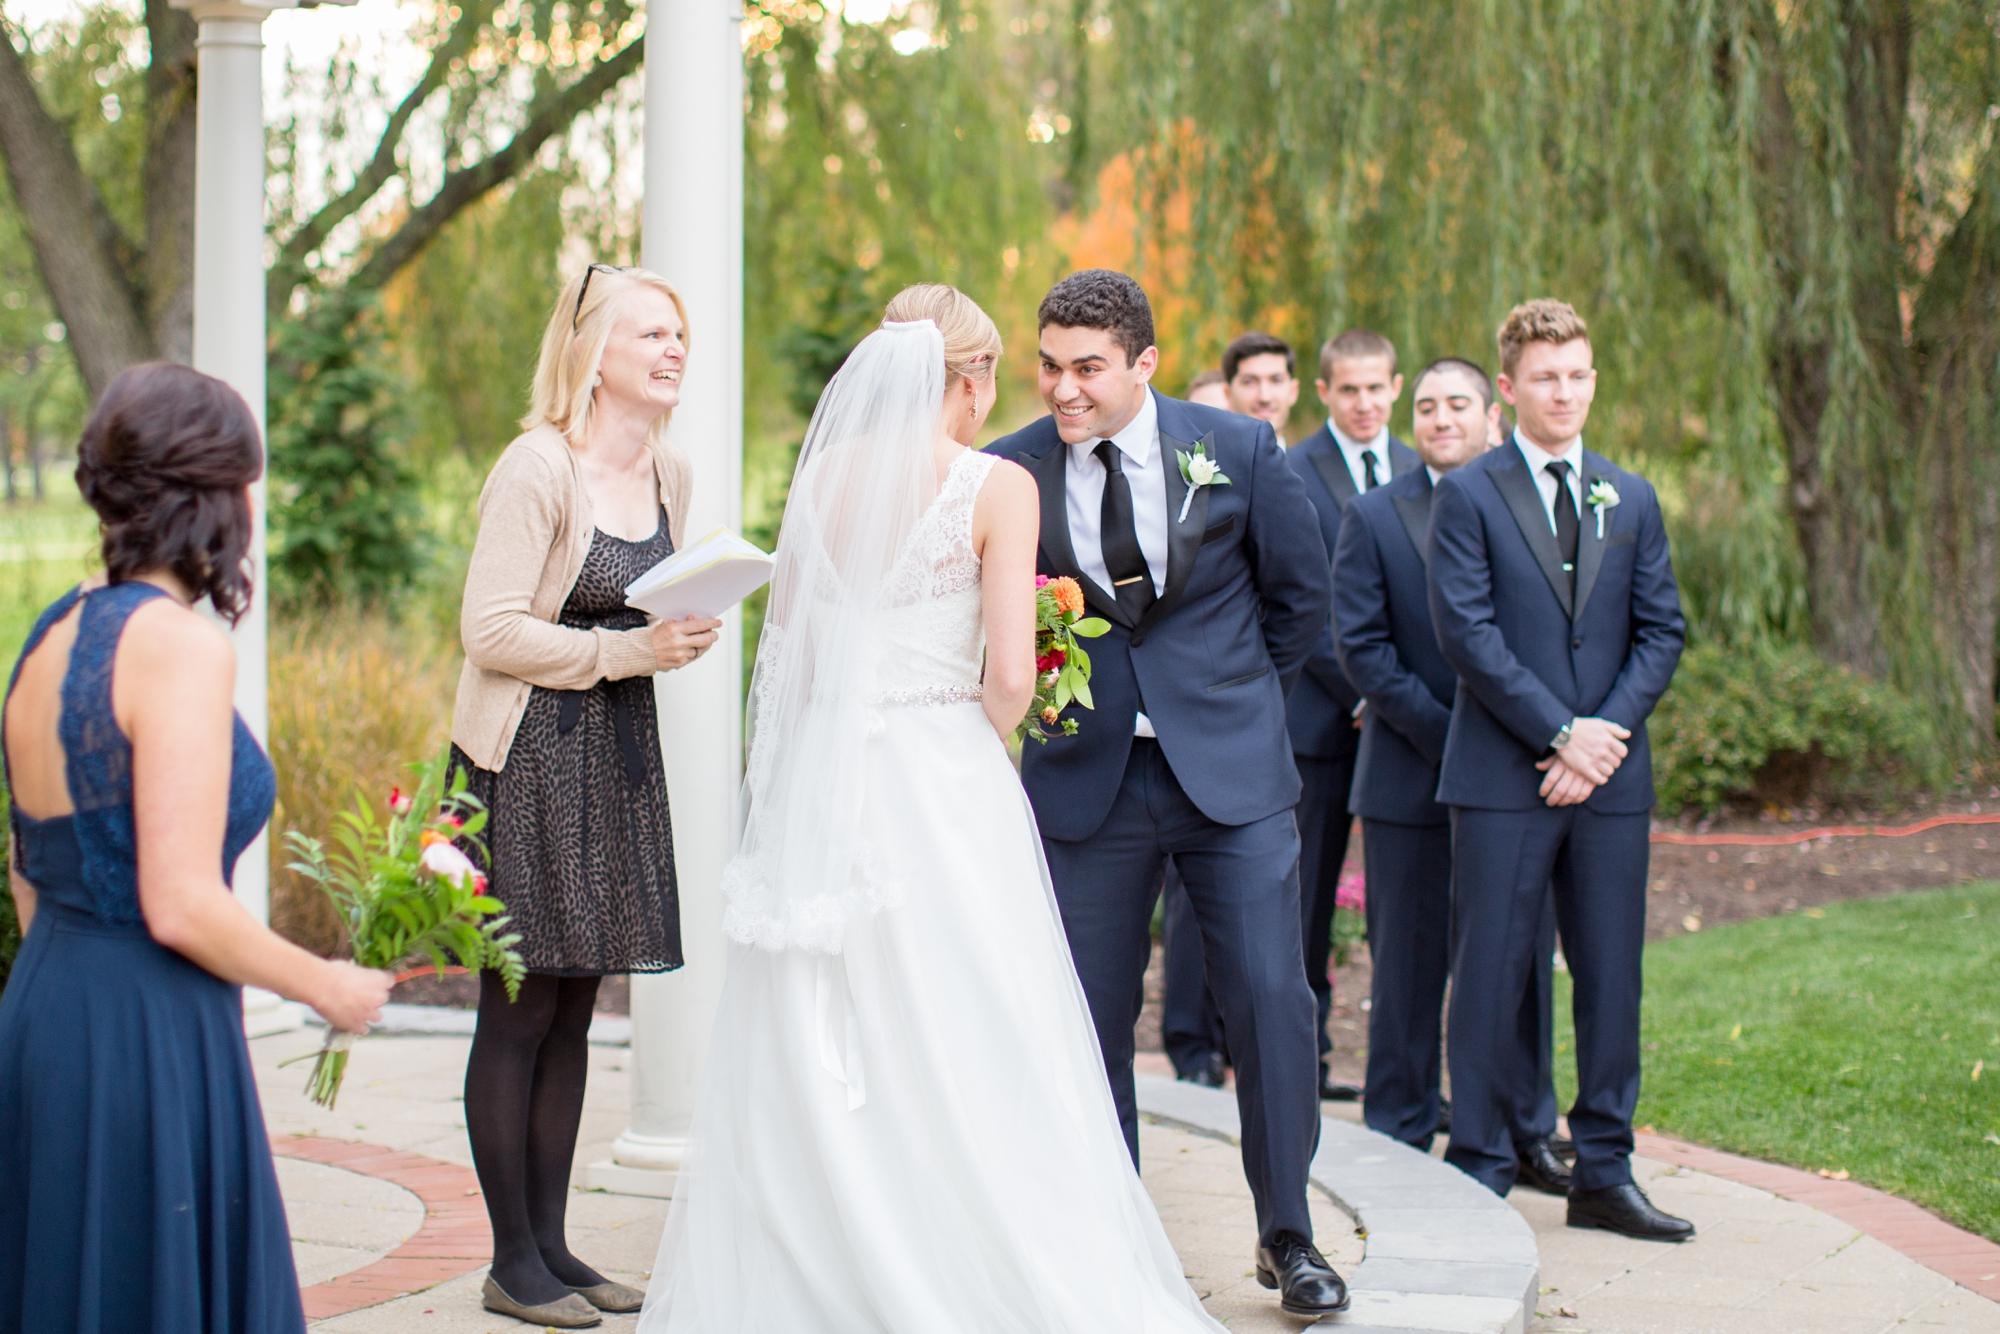 5-Finkel Wedding Ceremony-627_anna grace photography maryland wedding photographer turf valley.jpg